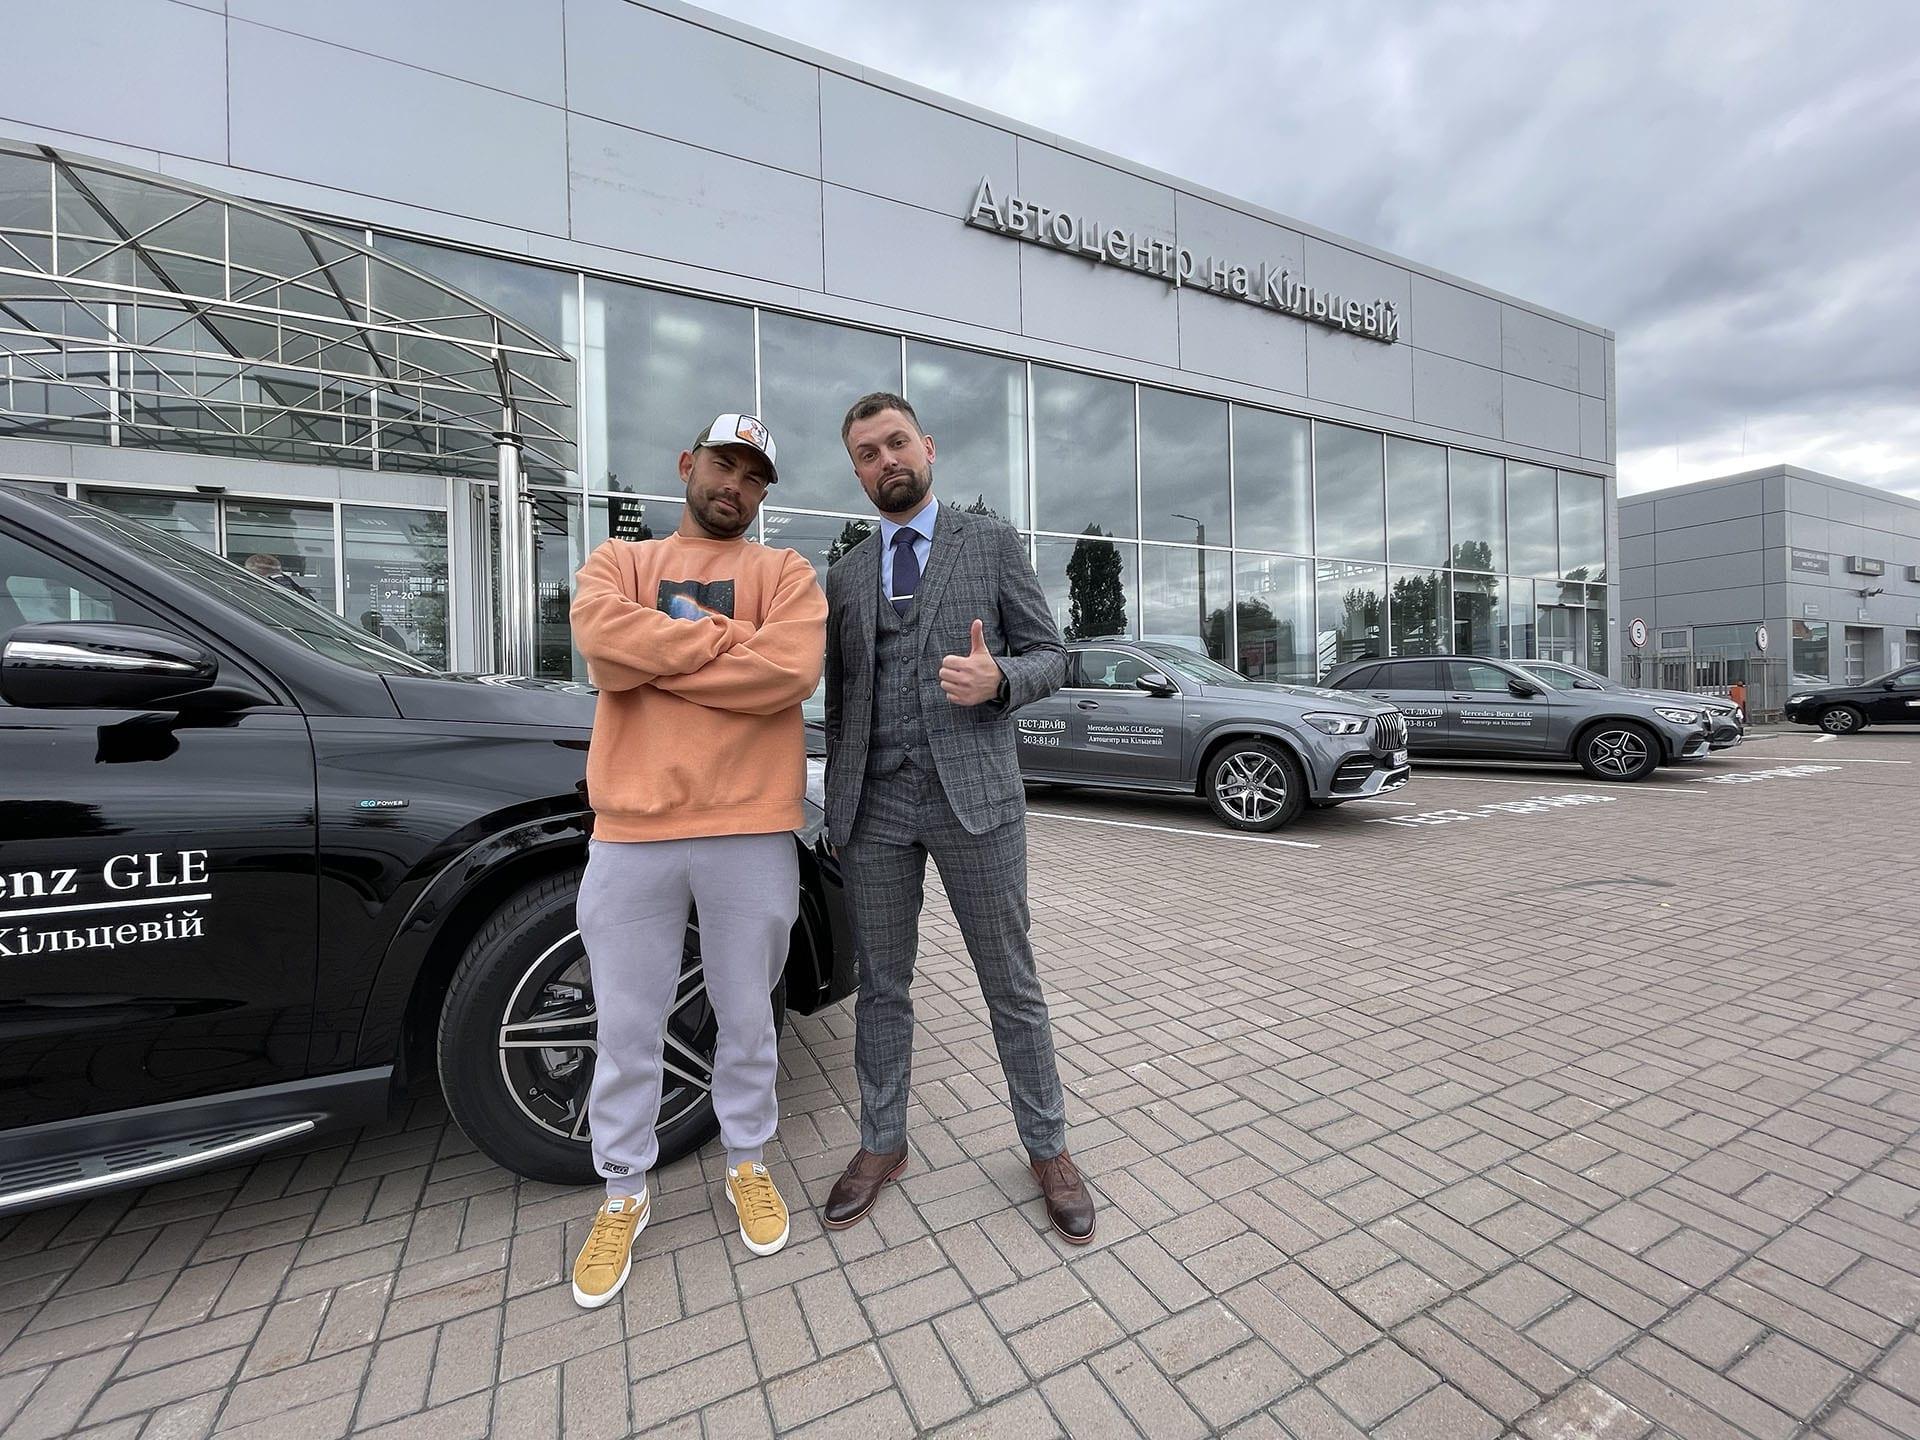 Тест-драйв Mercedes-Benz GLE 350 e с Андреем Бедняковым, звездой «Орёл и решка» и «X-Фактор»